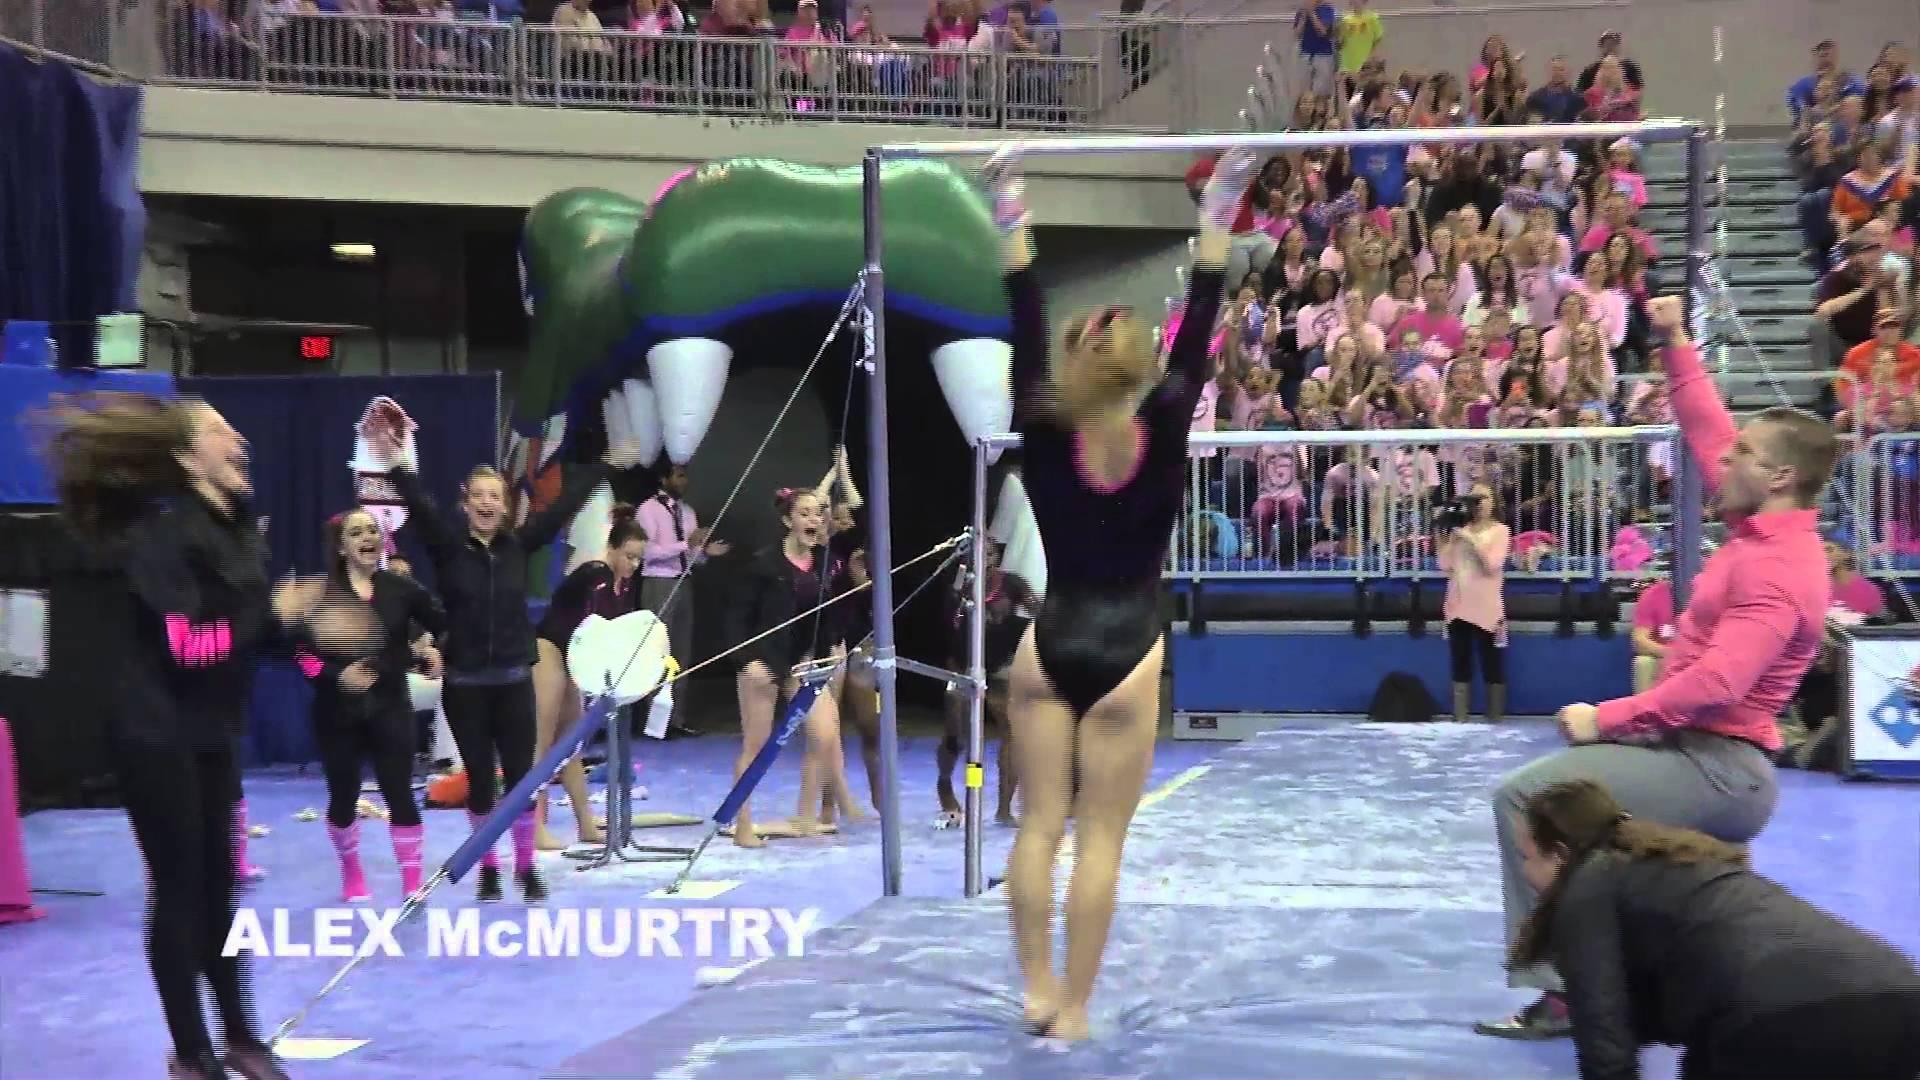 nittany gymnastics meet 2016 nfl